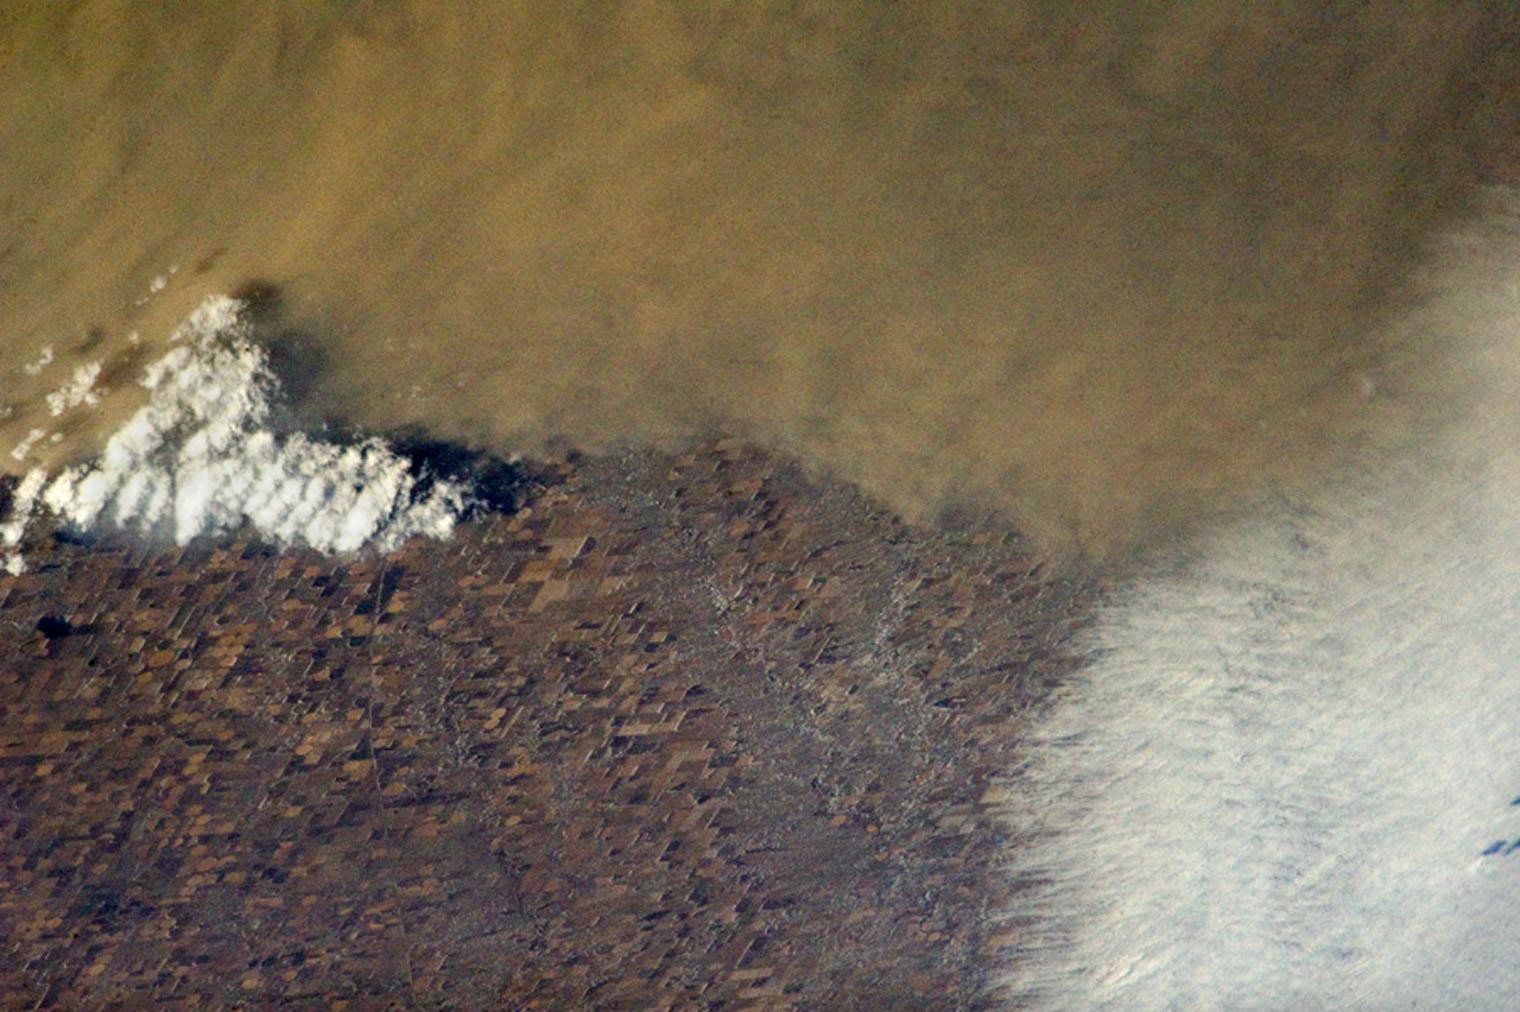 West coast Sandstorm, USA